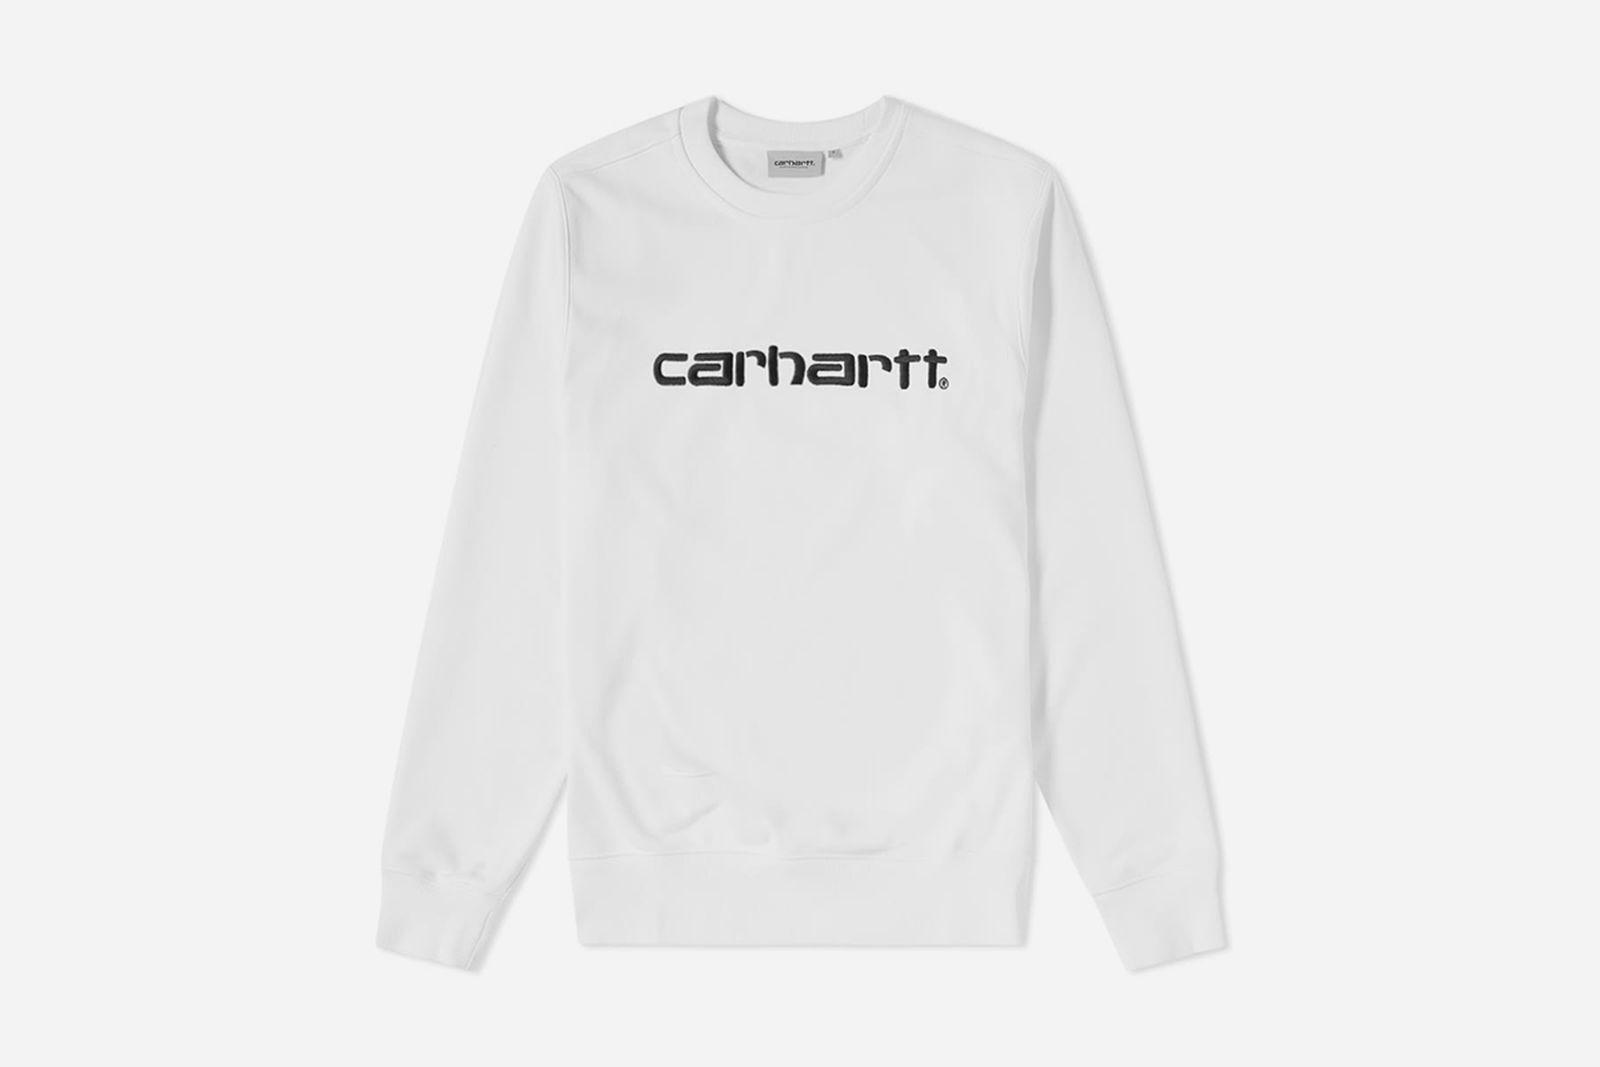 07 07 2018 carhartt sweat white black i024679 290 ja 1 Margiela Stüssy end